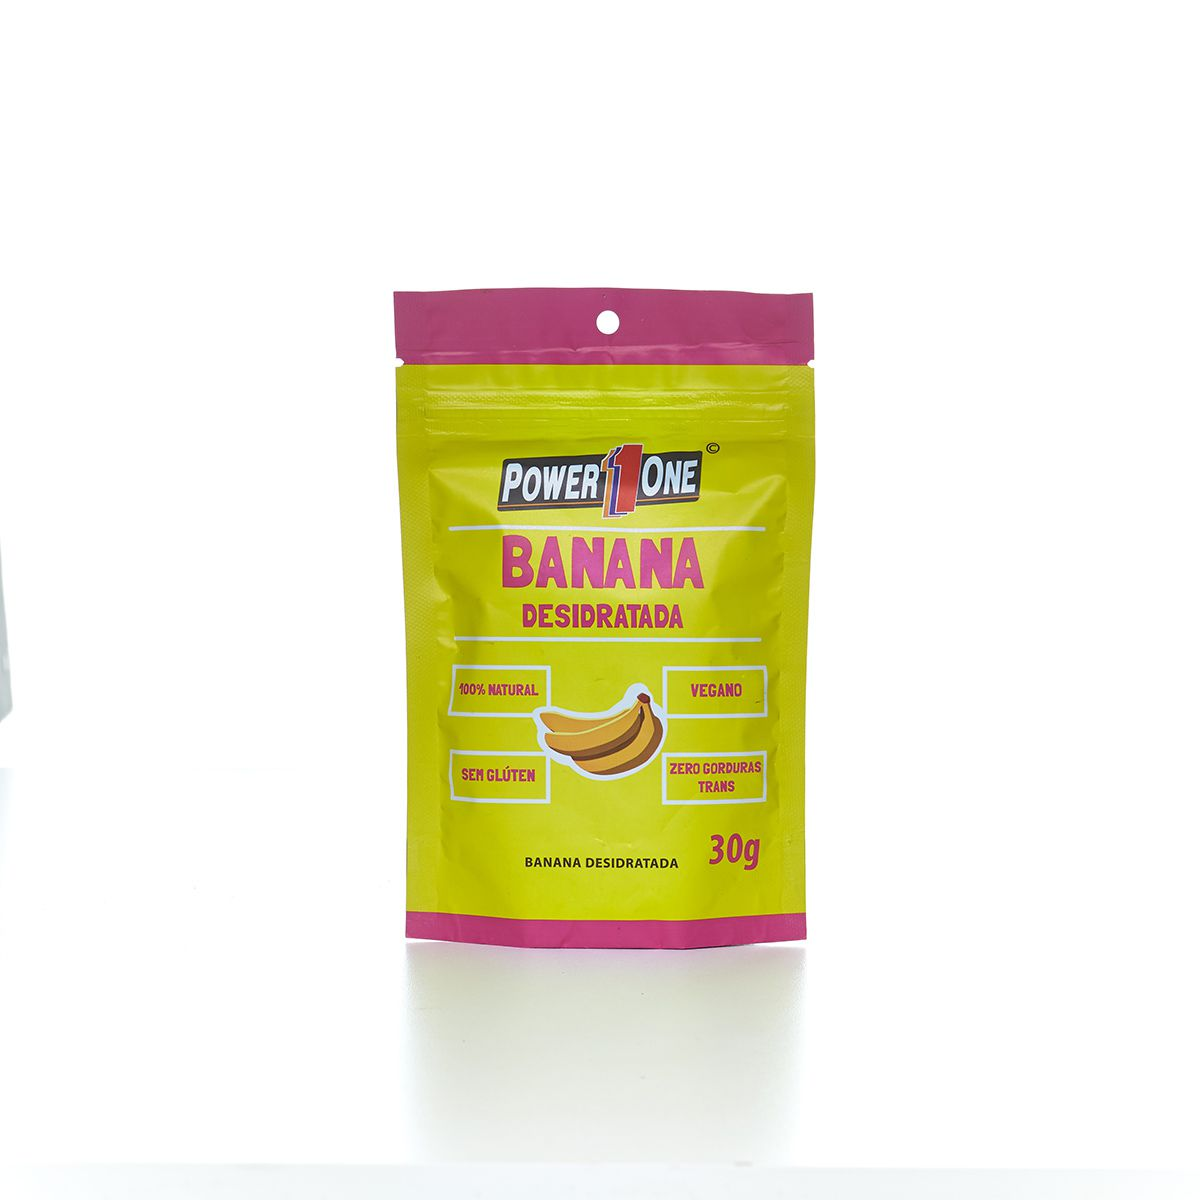 Banana Desidratada (30g) - Power1one